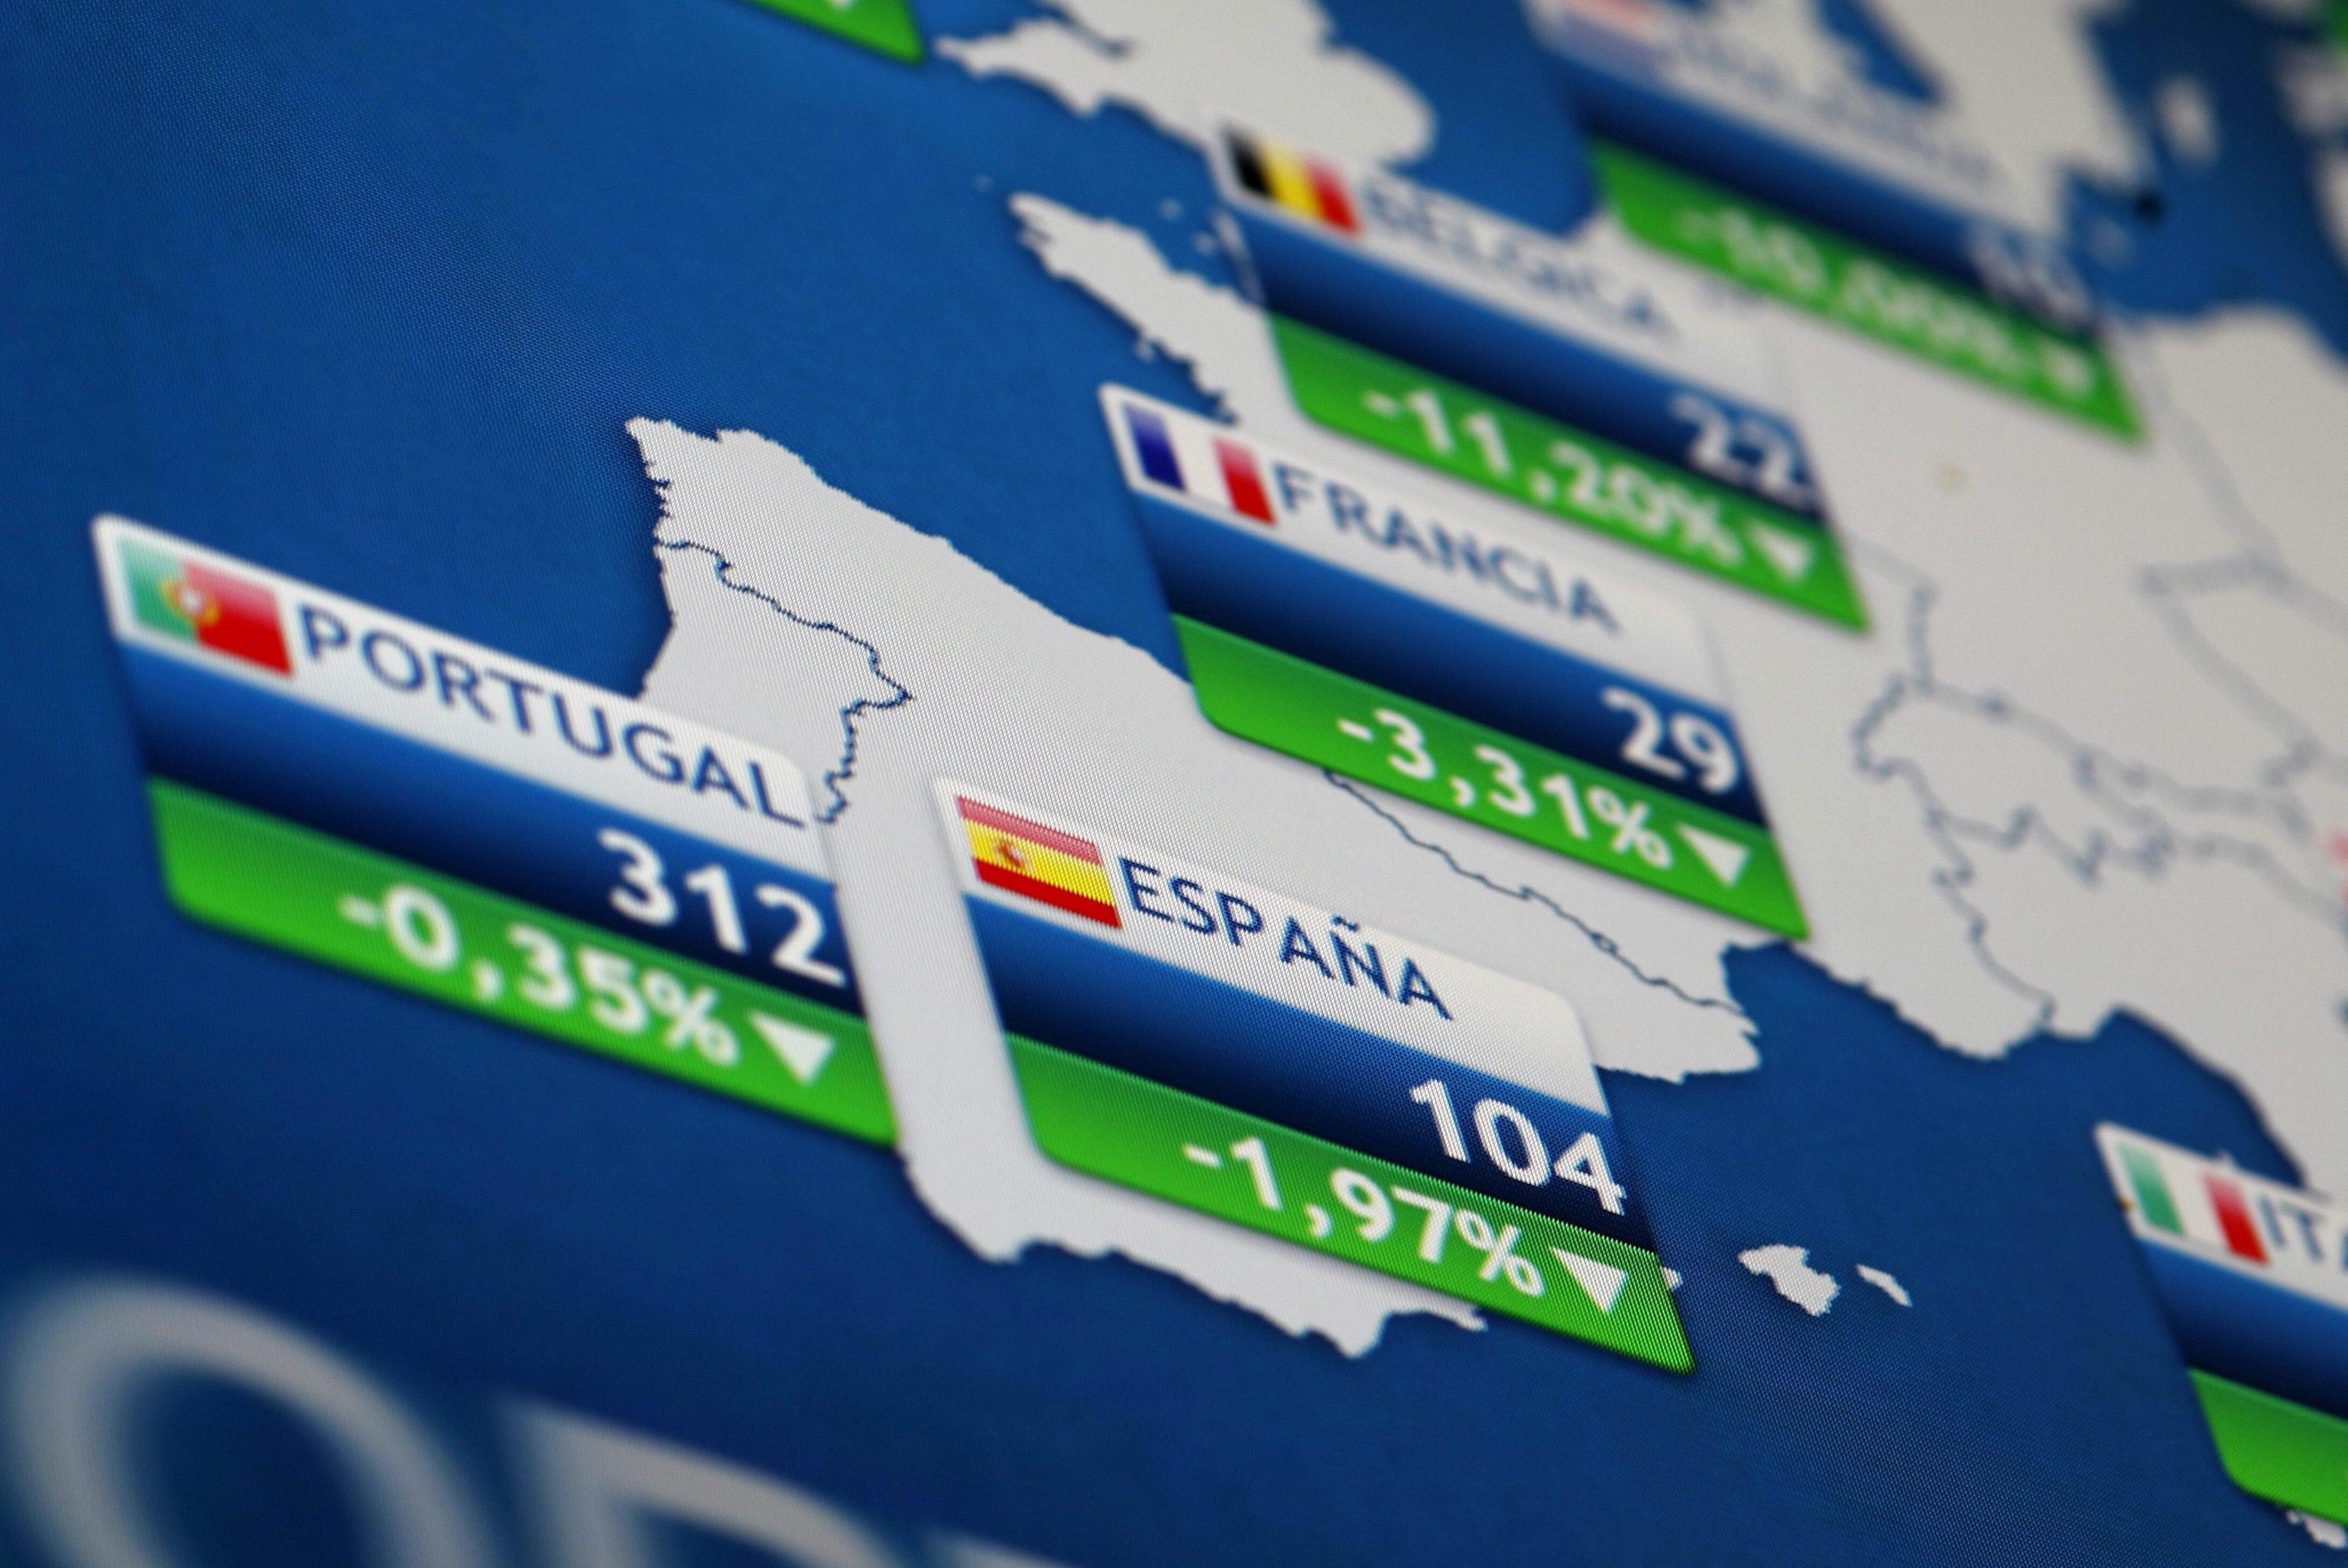 Borsa: Europa, Parigi +1,05% in chiusura